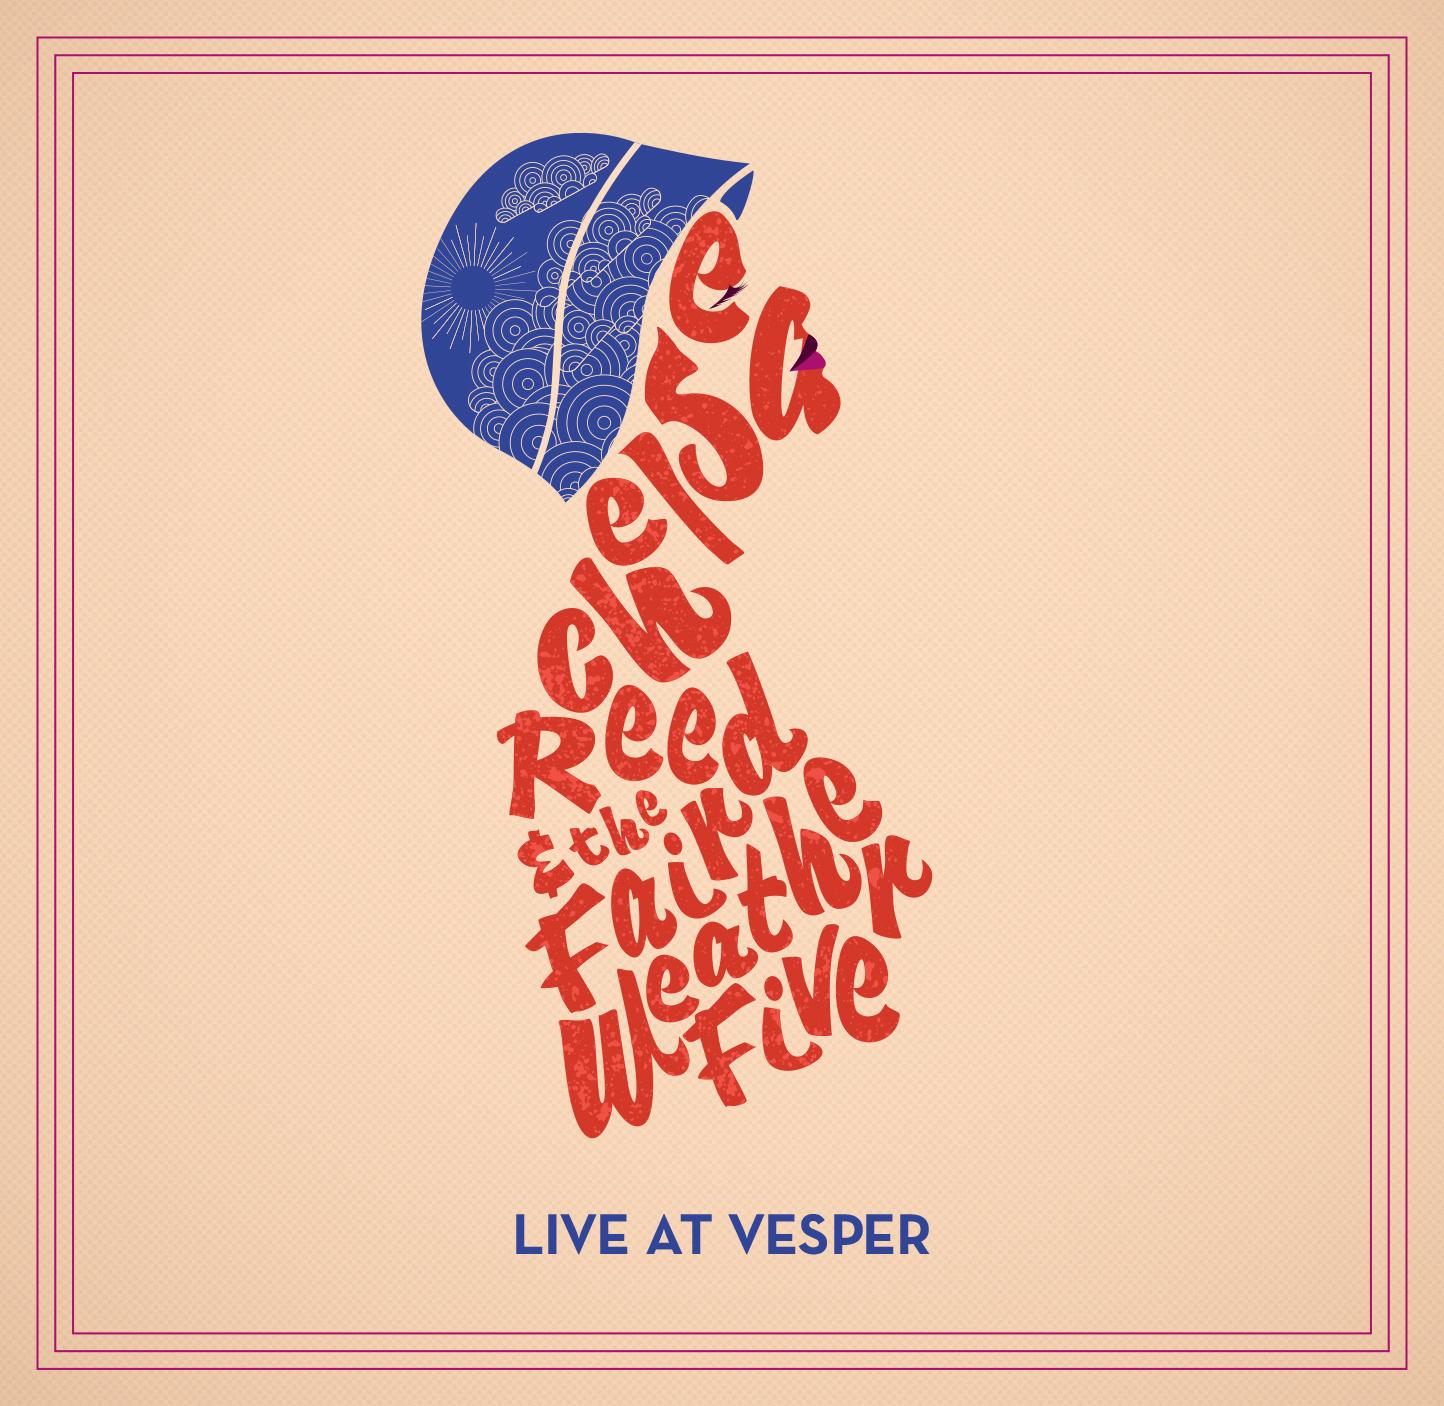 Live at Vesper (2015) - 1.Blue Drag (Live)2.Ain't Nobody's Business (Live)3. Mood Indigo (Live)4. Fine and Mellow (Live)5. Do I Move You (Live)